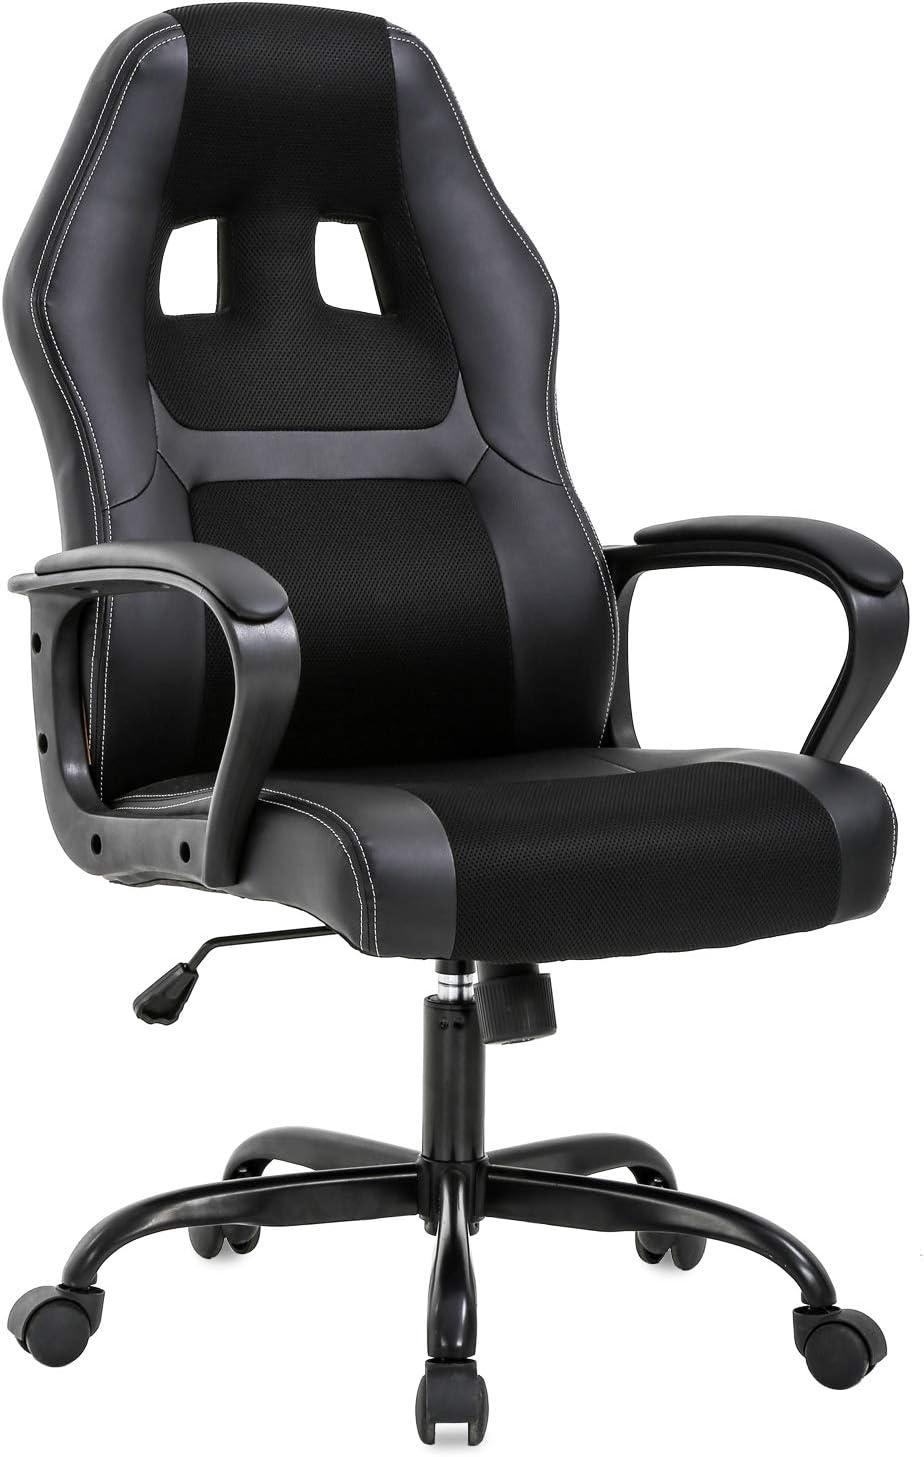 Office security Chair PC Gaming Cheap Daily bargain sale Leath PU Ergonomic Desk